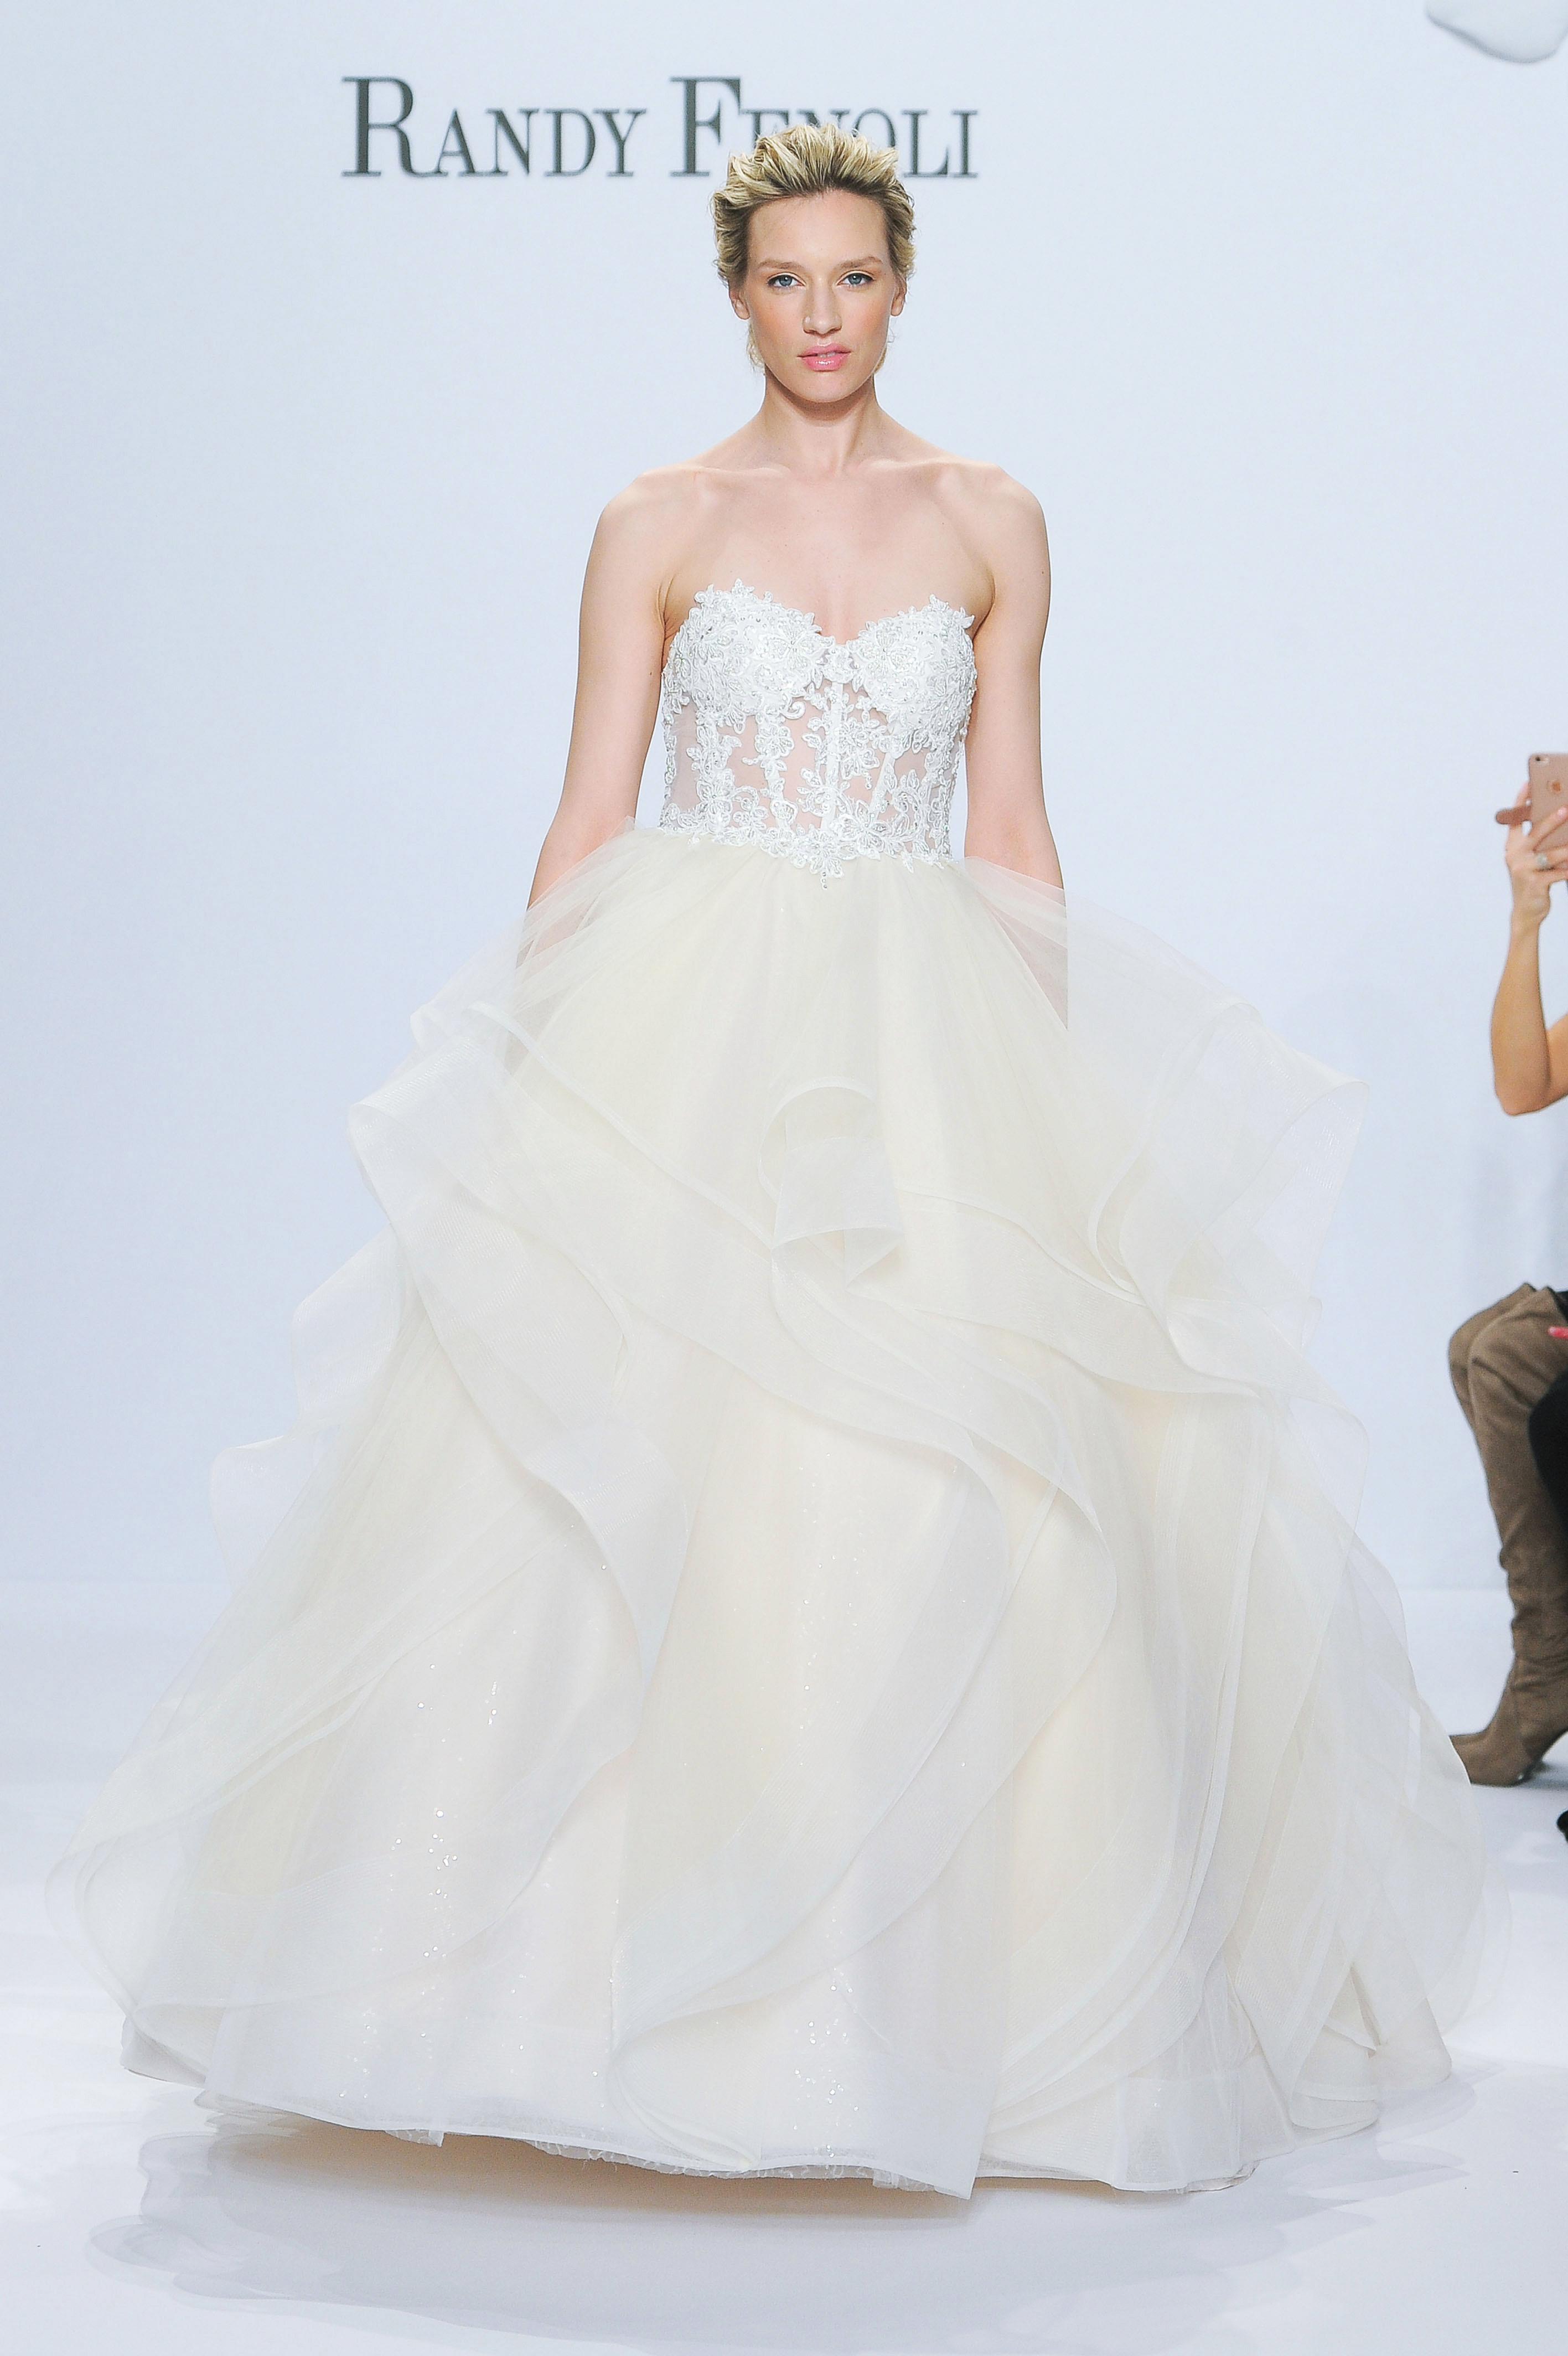 randy fenoli strapless ball gown wedding dress spring 2018